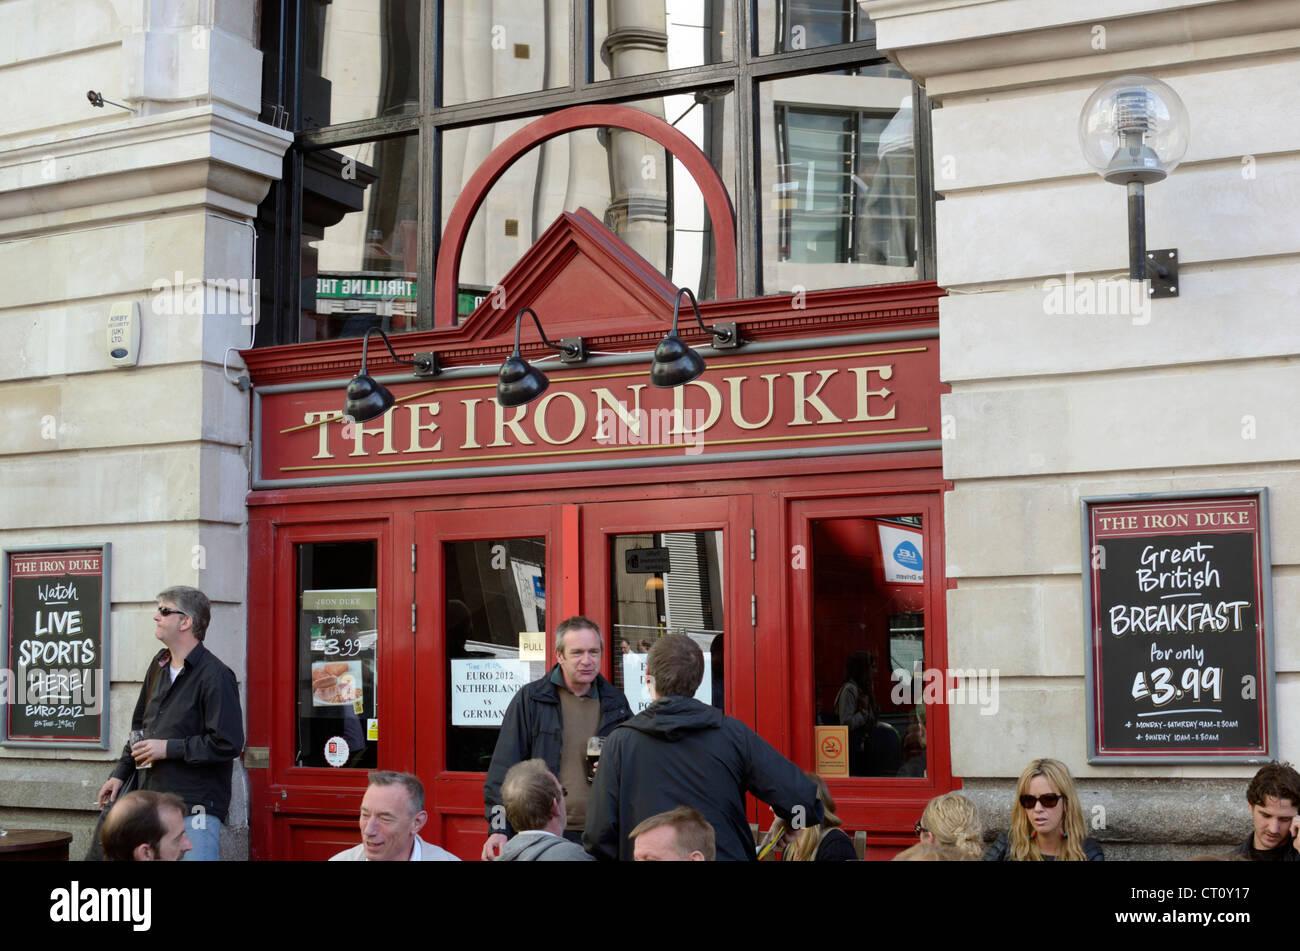 Customers outside the Iron Duke pub, Victoria Railway Station, London, UK - Stock Image